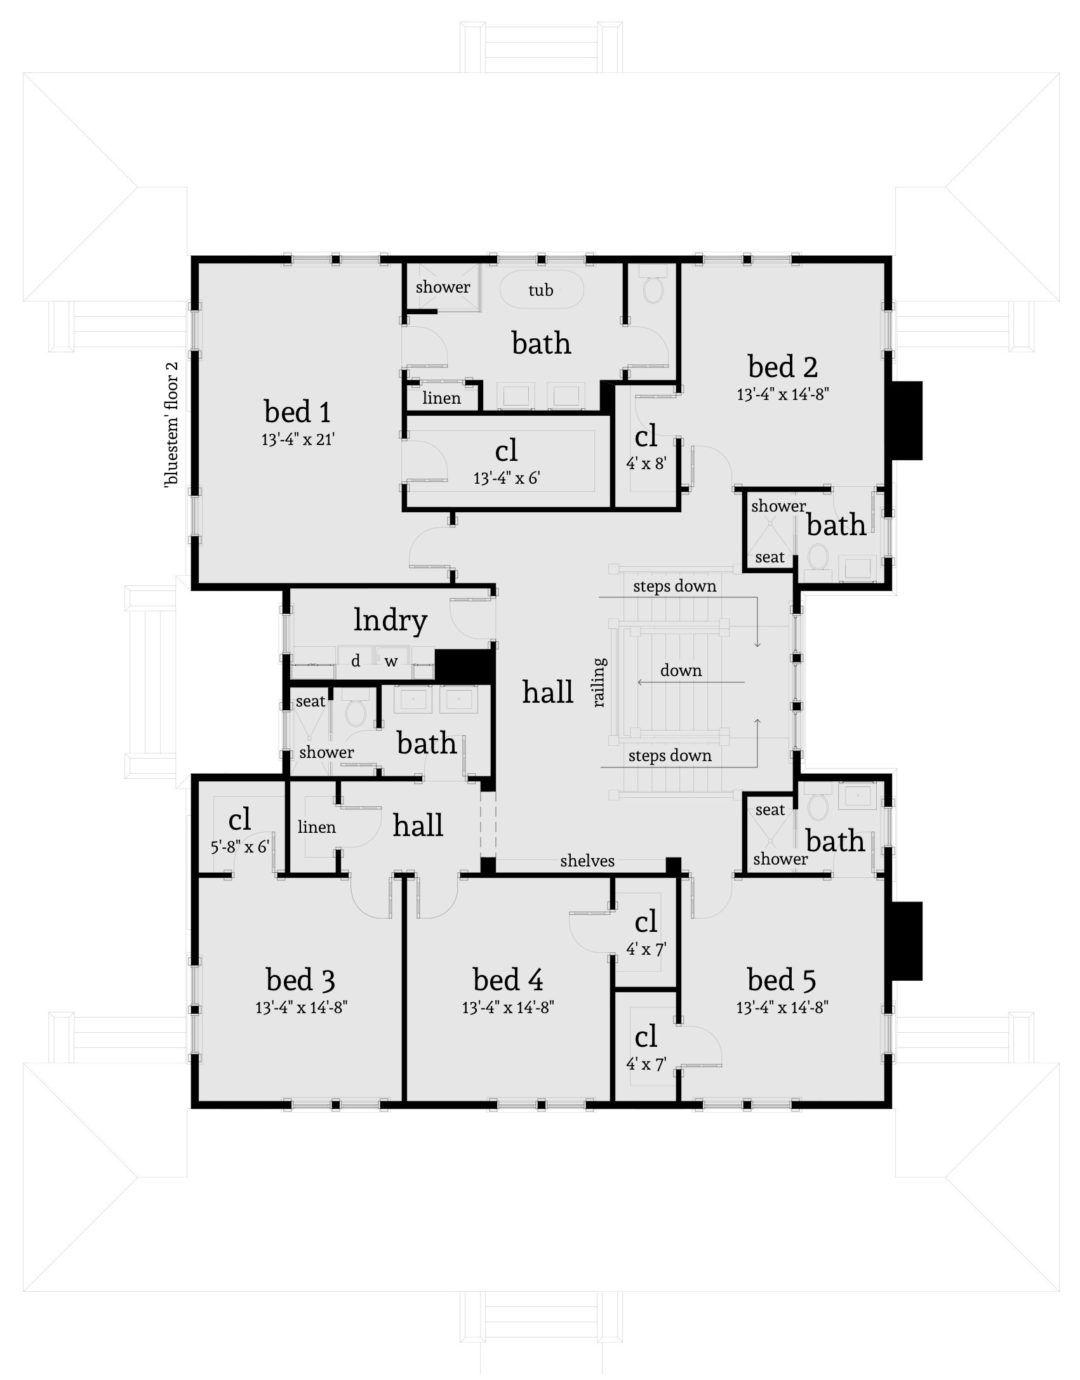 5 Bedroom 5 Bath Farmhouse Plan 4 Car Garage Tyree House Plans Country Style House Plans House Plans Farmhouse Style House Plans